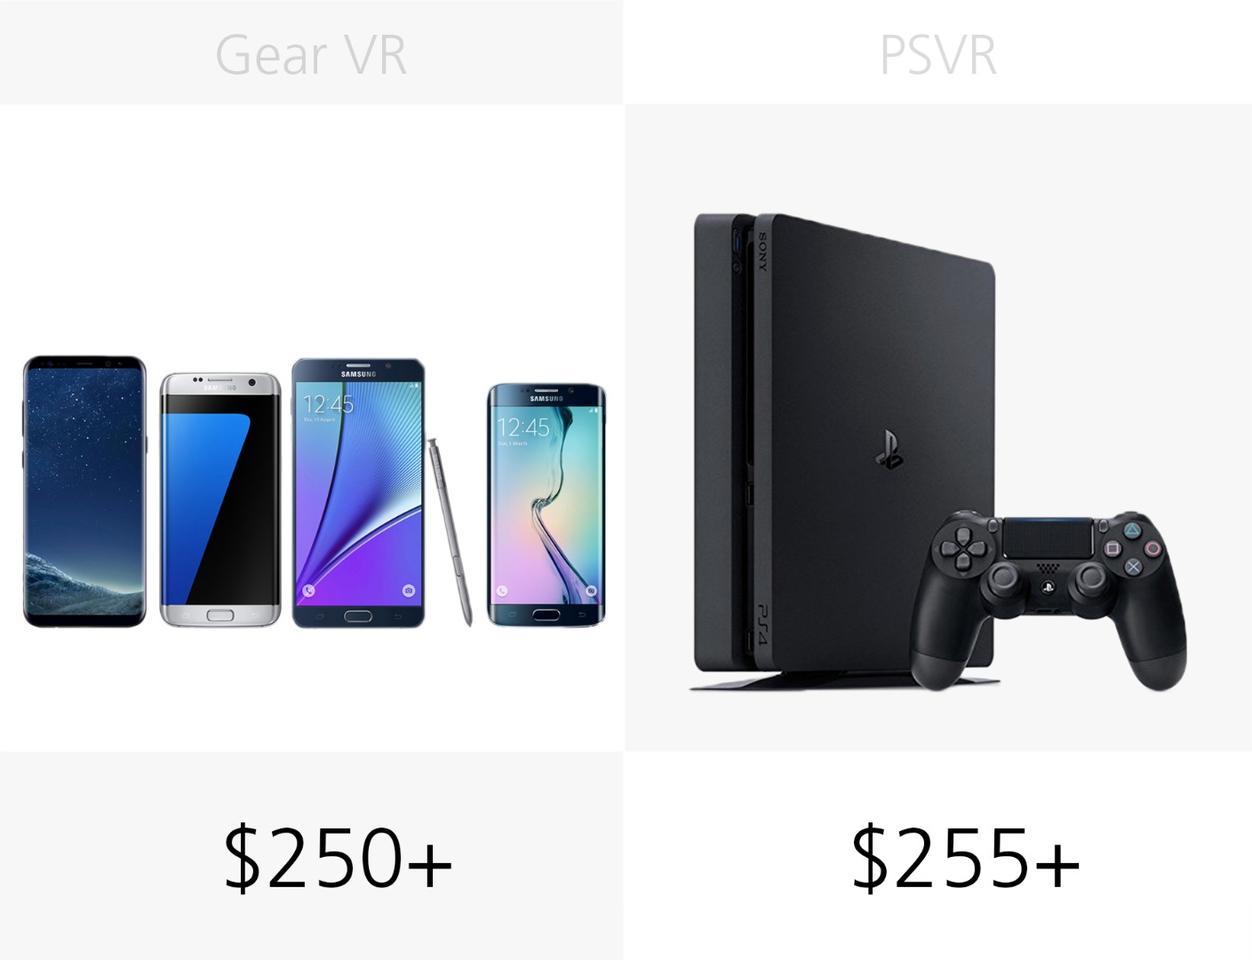 Host device starting price